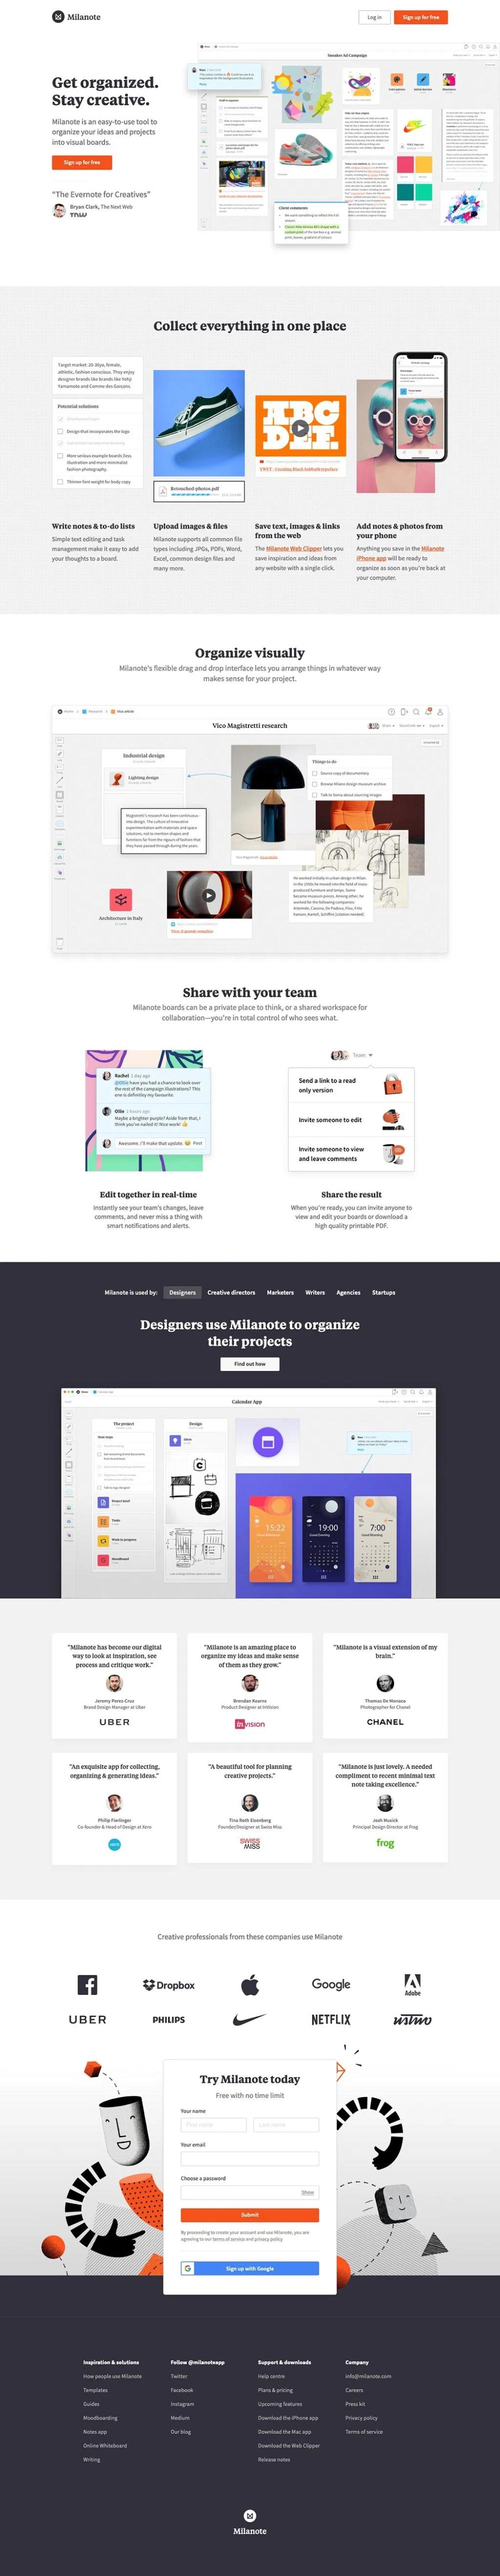 Milanote Com H69 Design Landing Page Design Page Design Landing Page